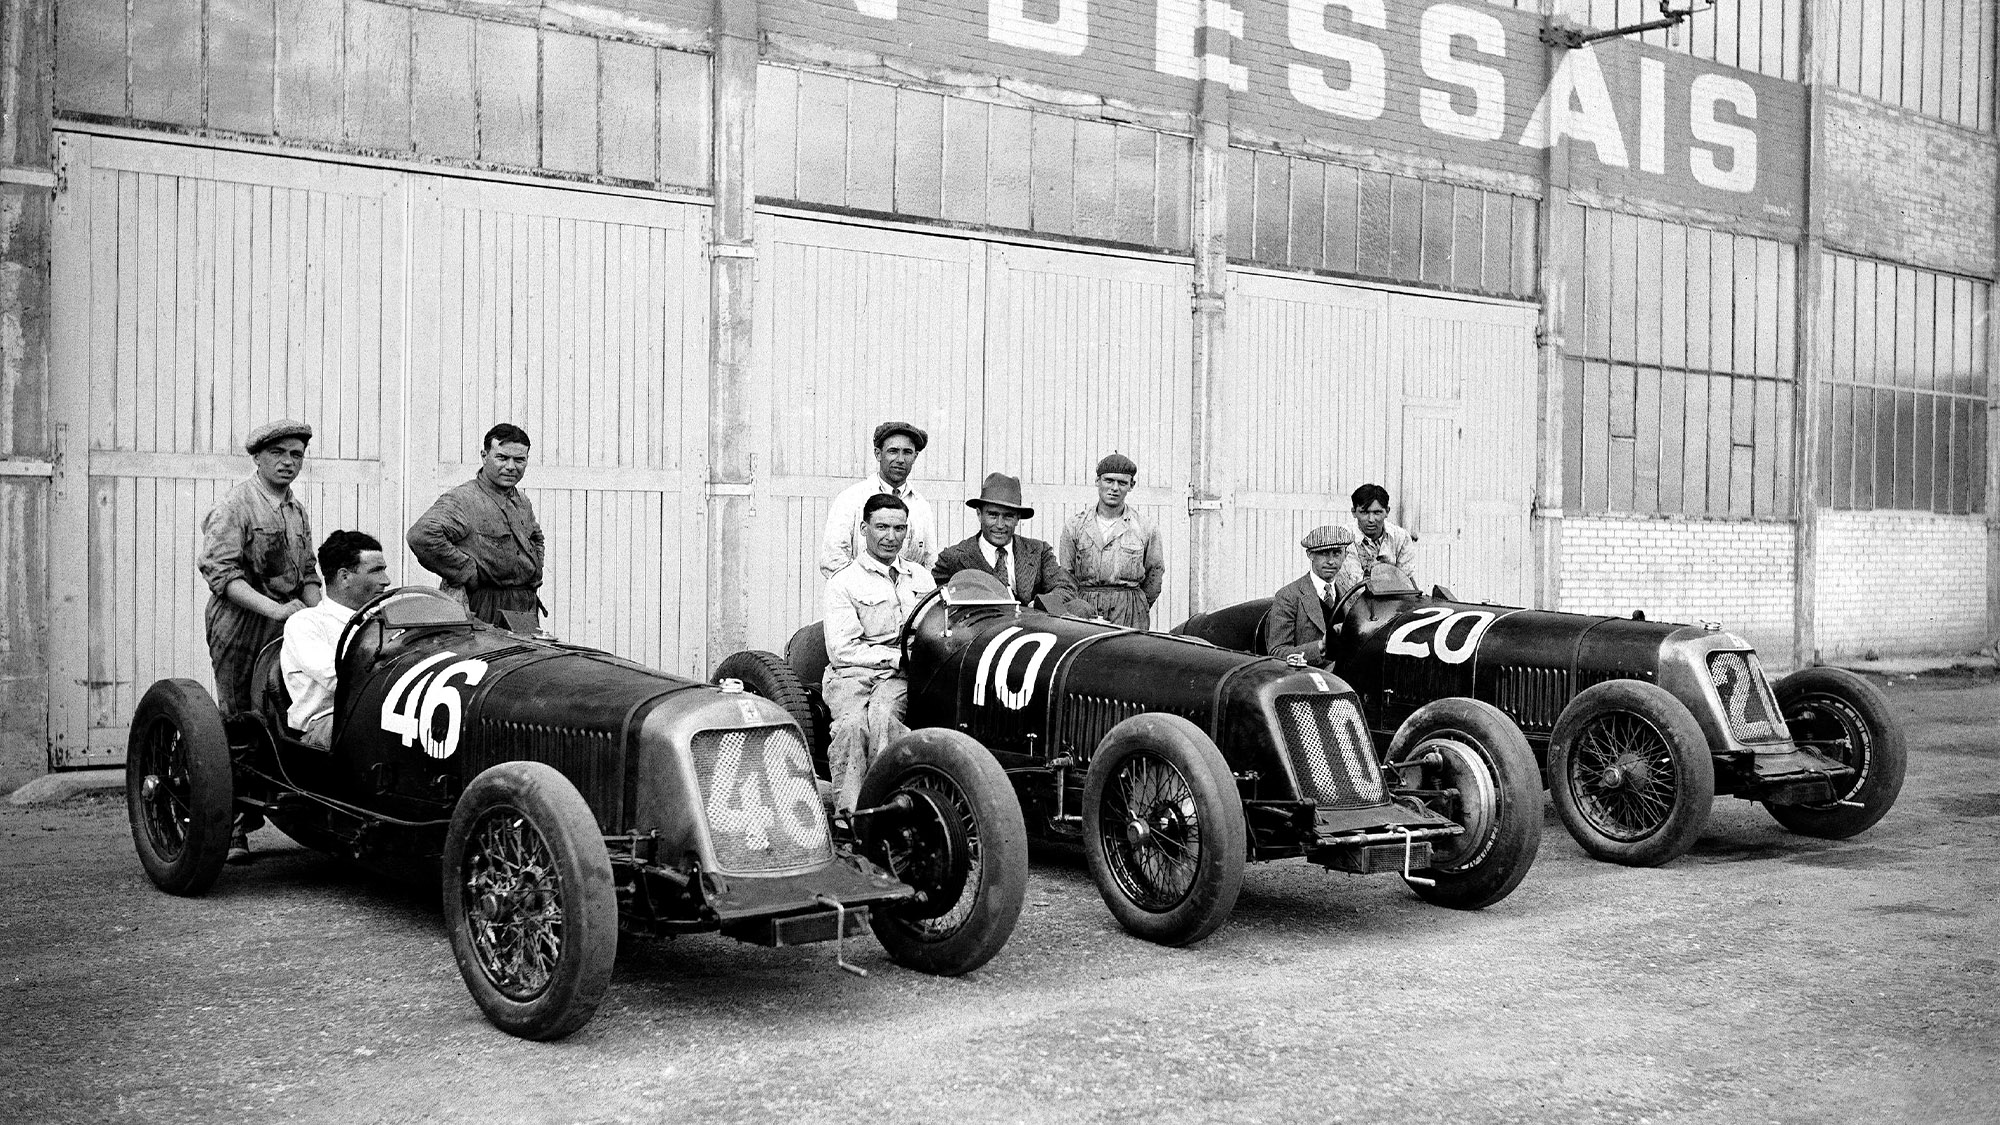 Maserati team before the 1931 French Grand Prix at Montlhery with Clement Biondetti, Luigi Parenti, Luigi Fagioli, Ernesto Maserati and René Dreyfus, Pietro Ghersi